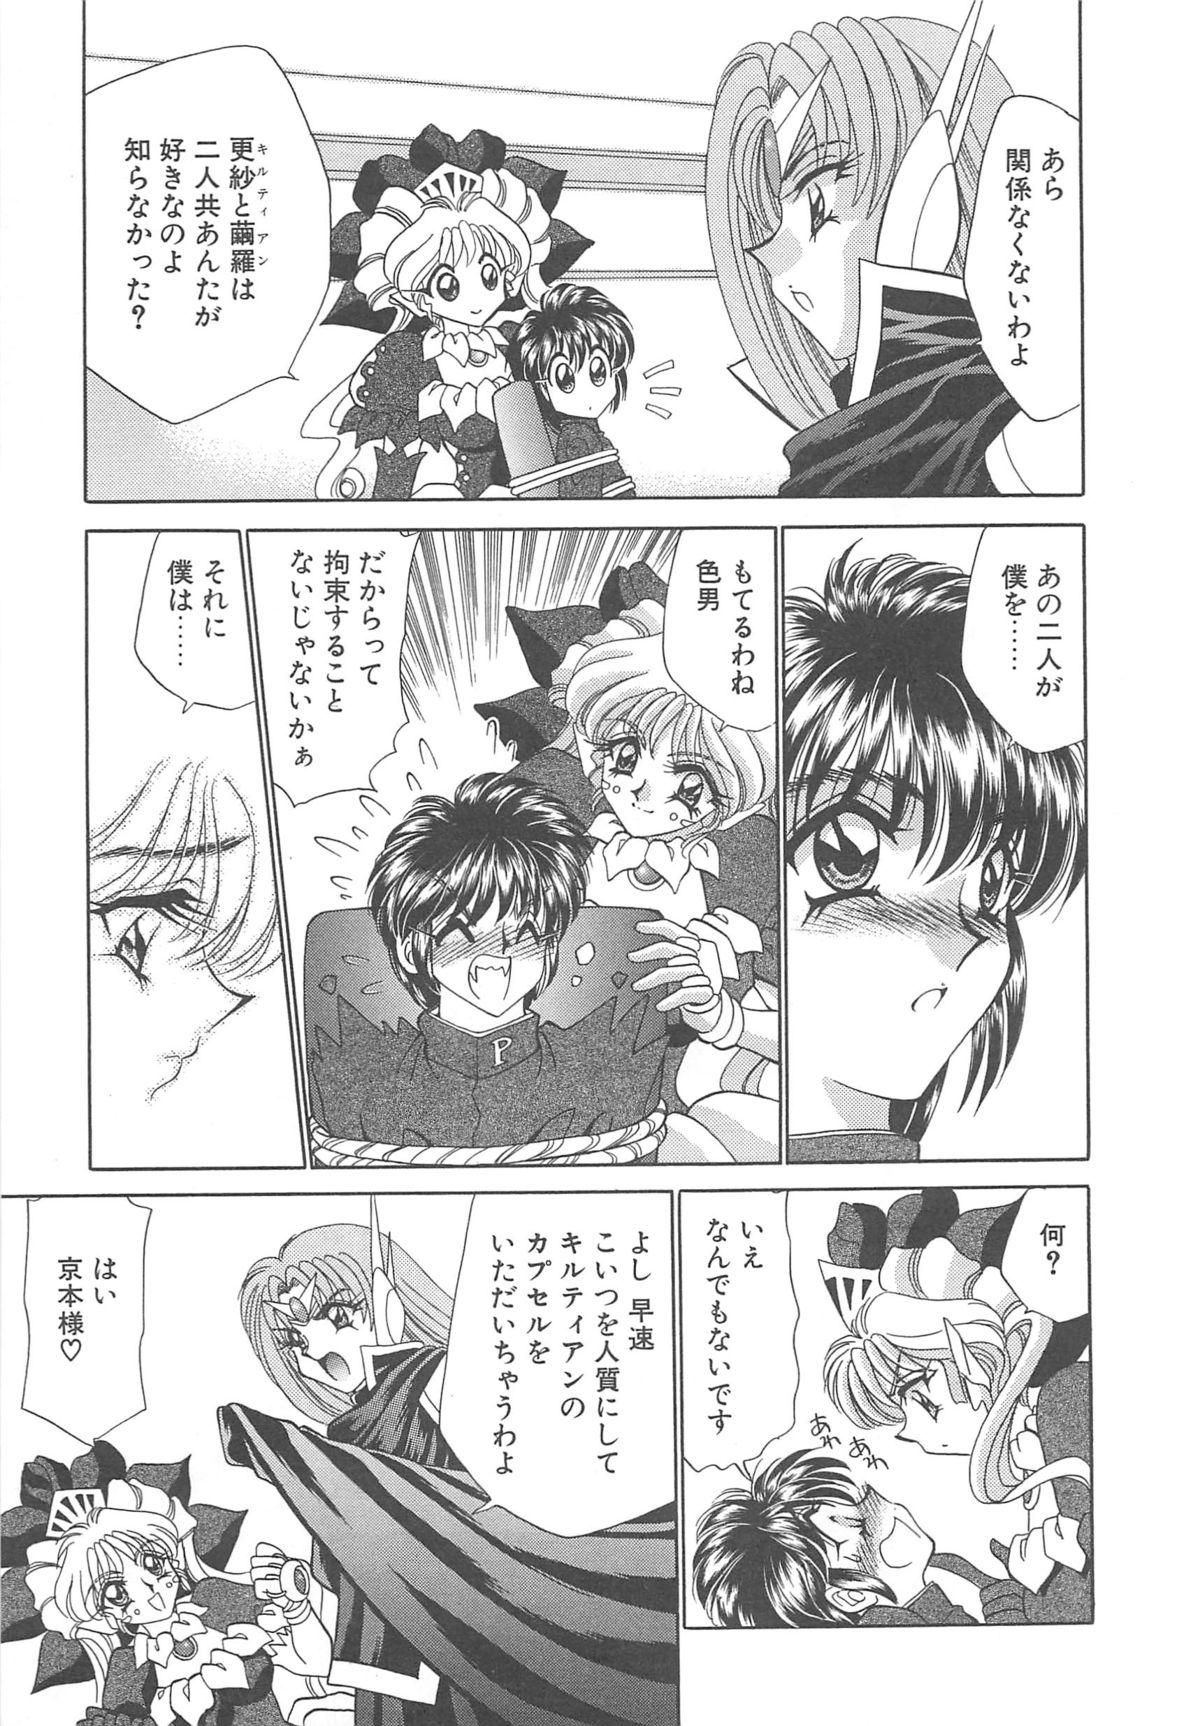 Kigurumi Sentai Quiltian 171